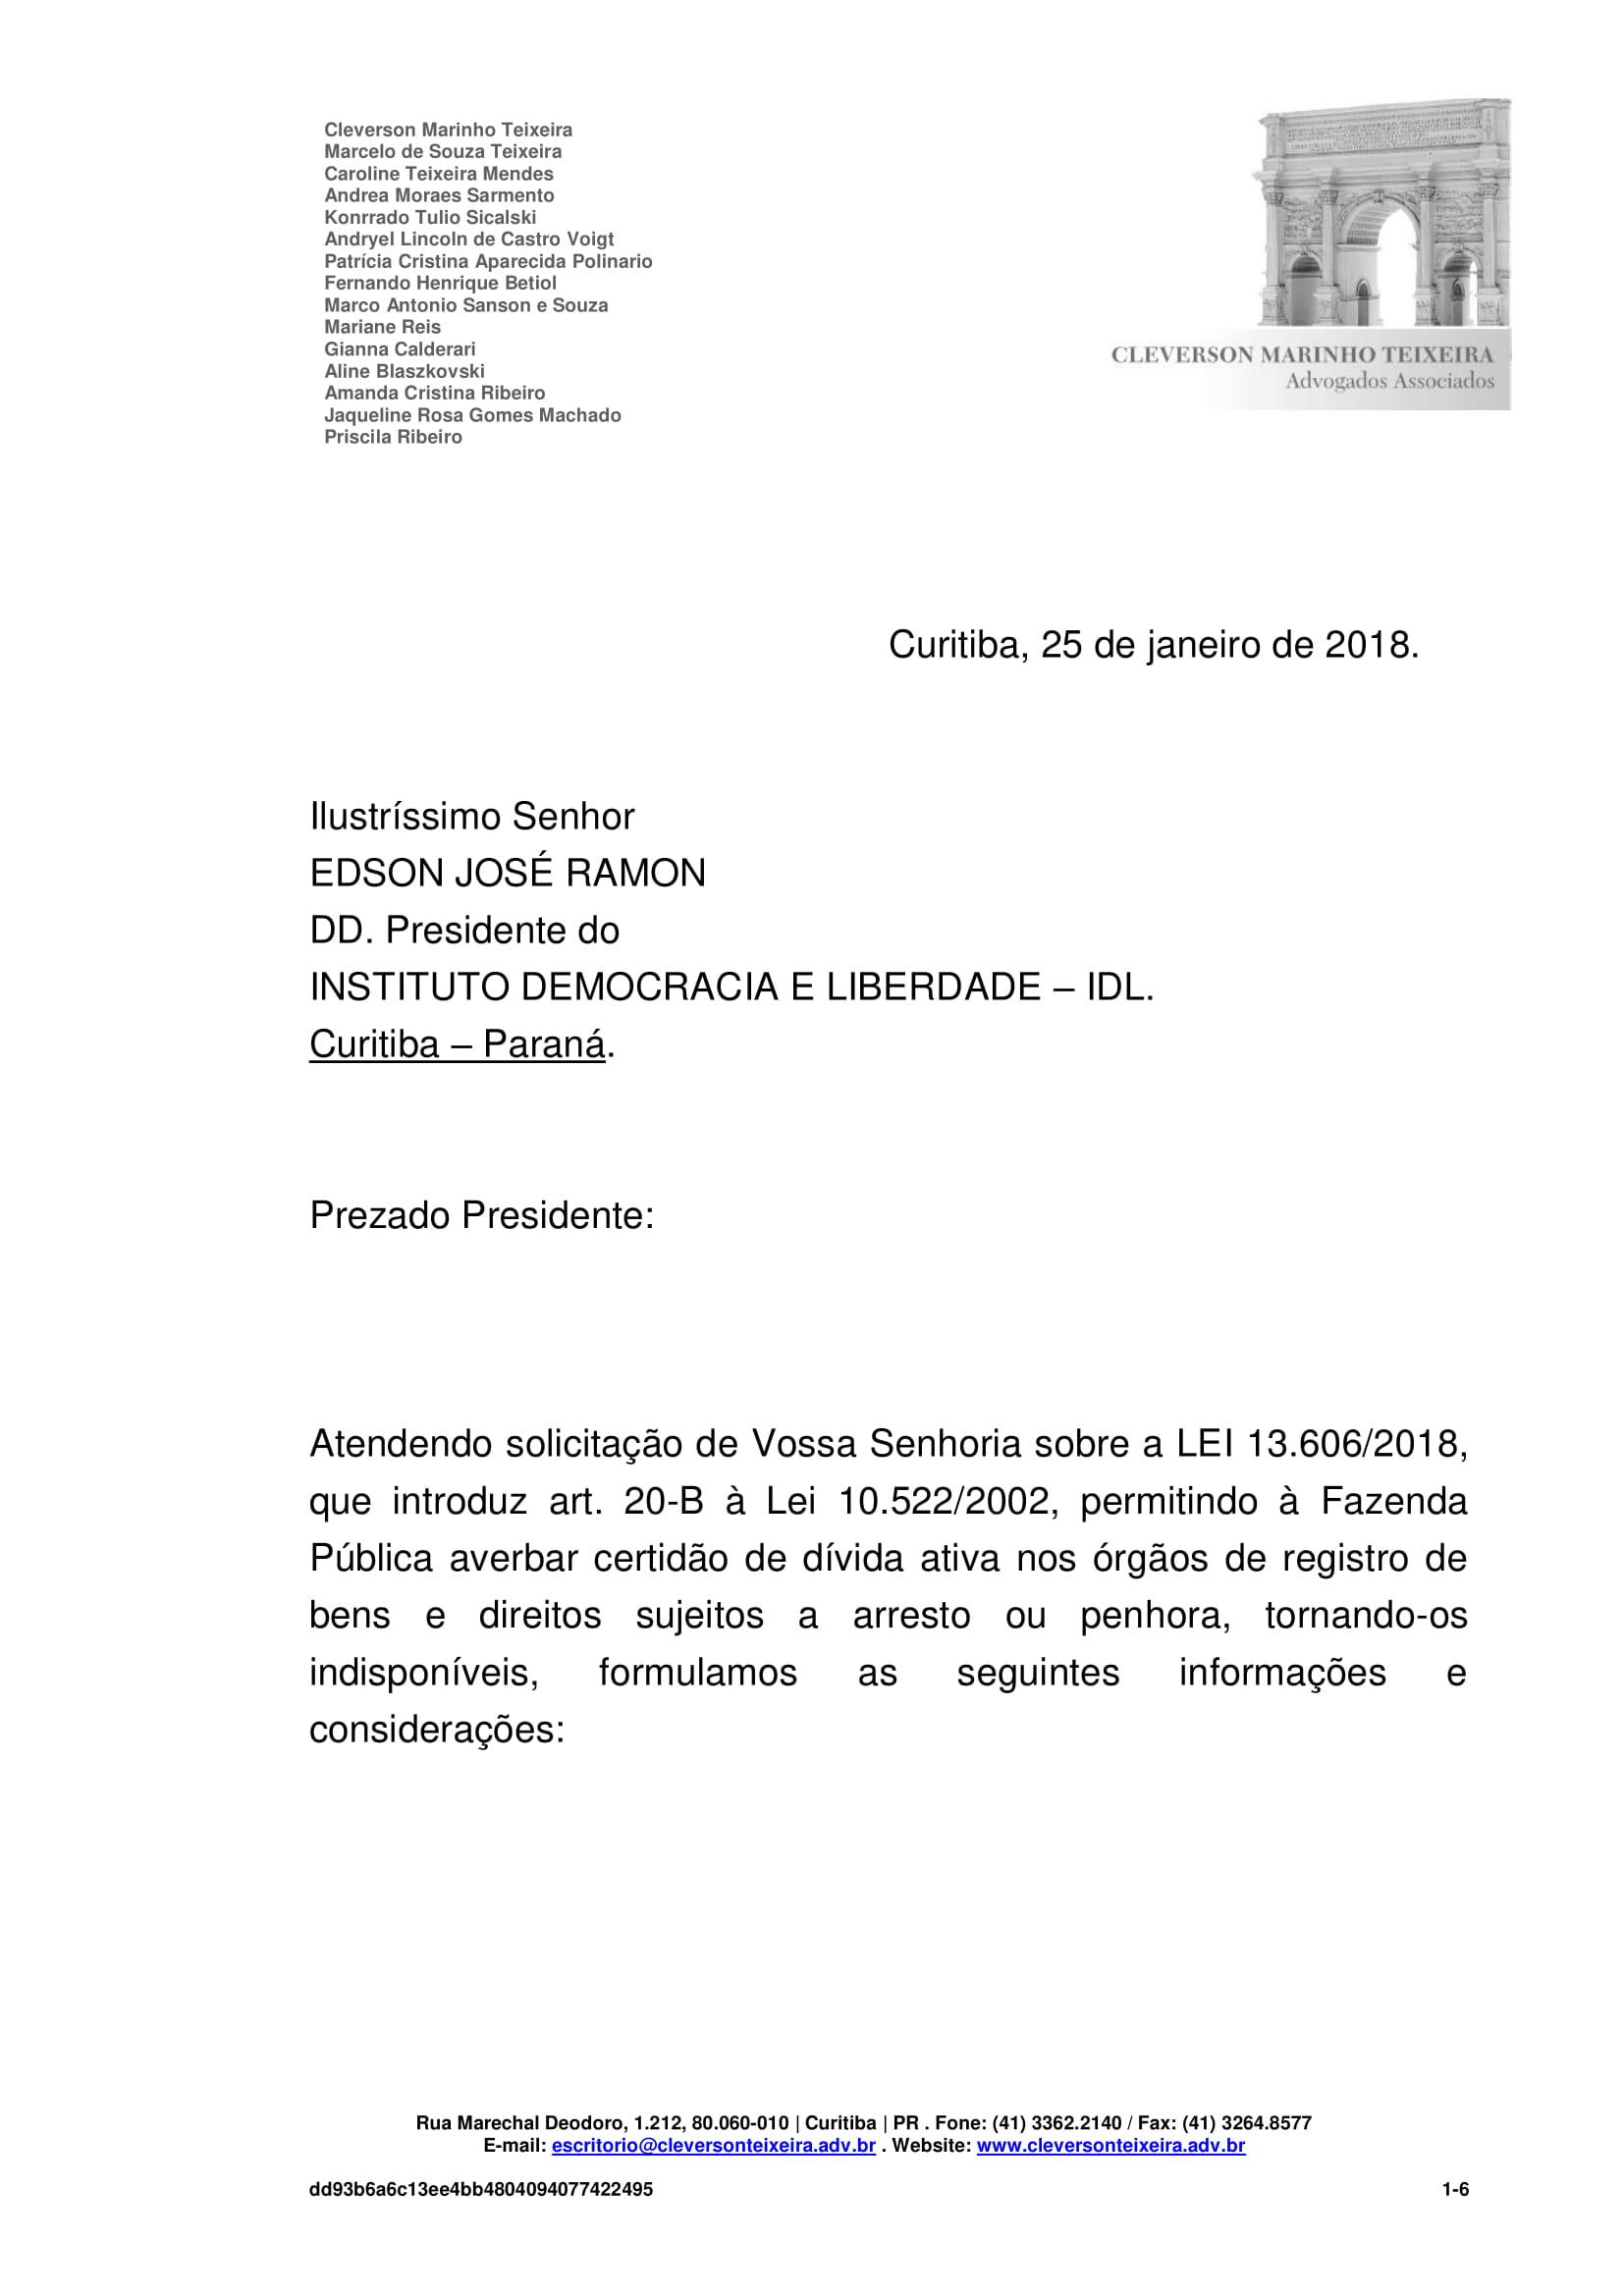 MANIFESTAÇÃO - IDL 2 (25 01 2016) (1)-1